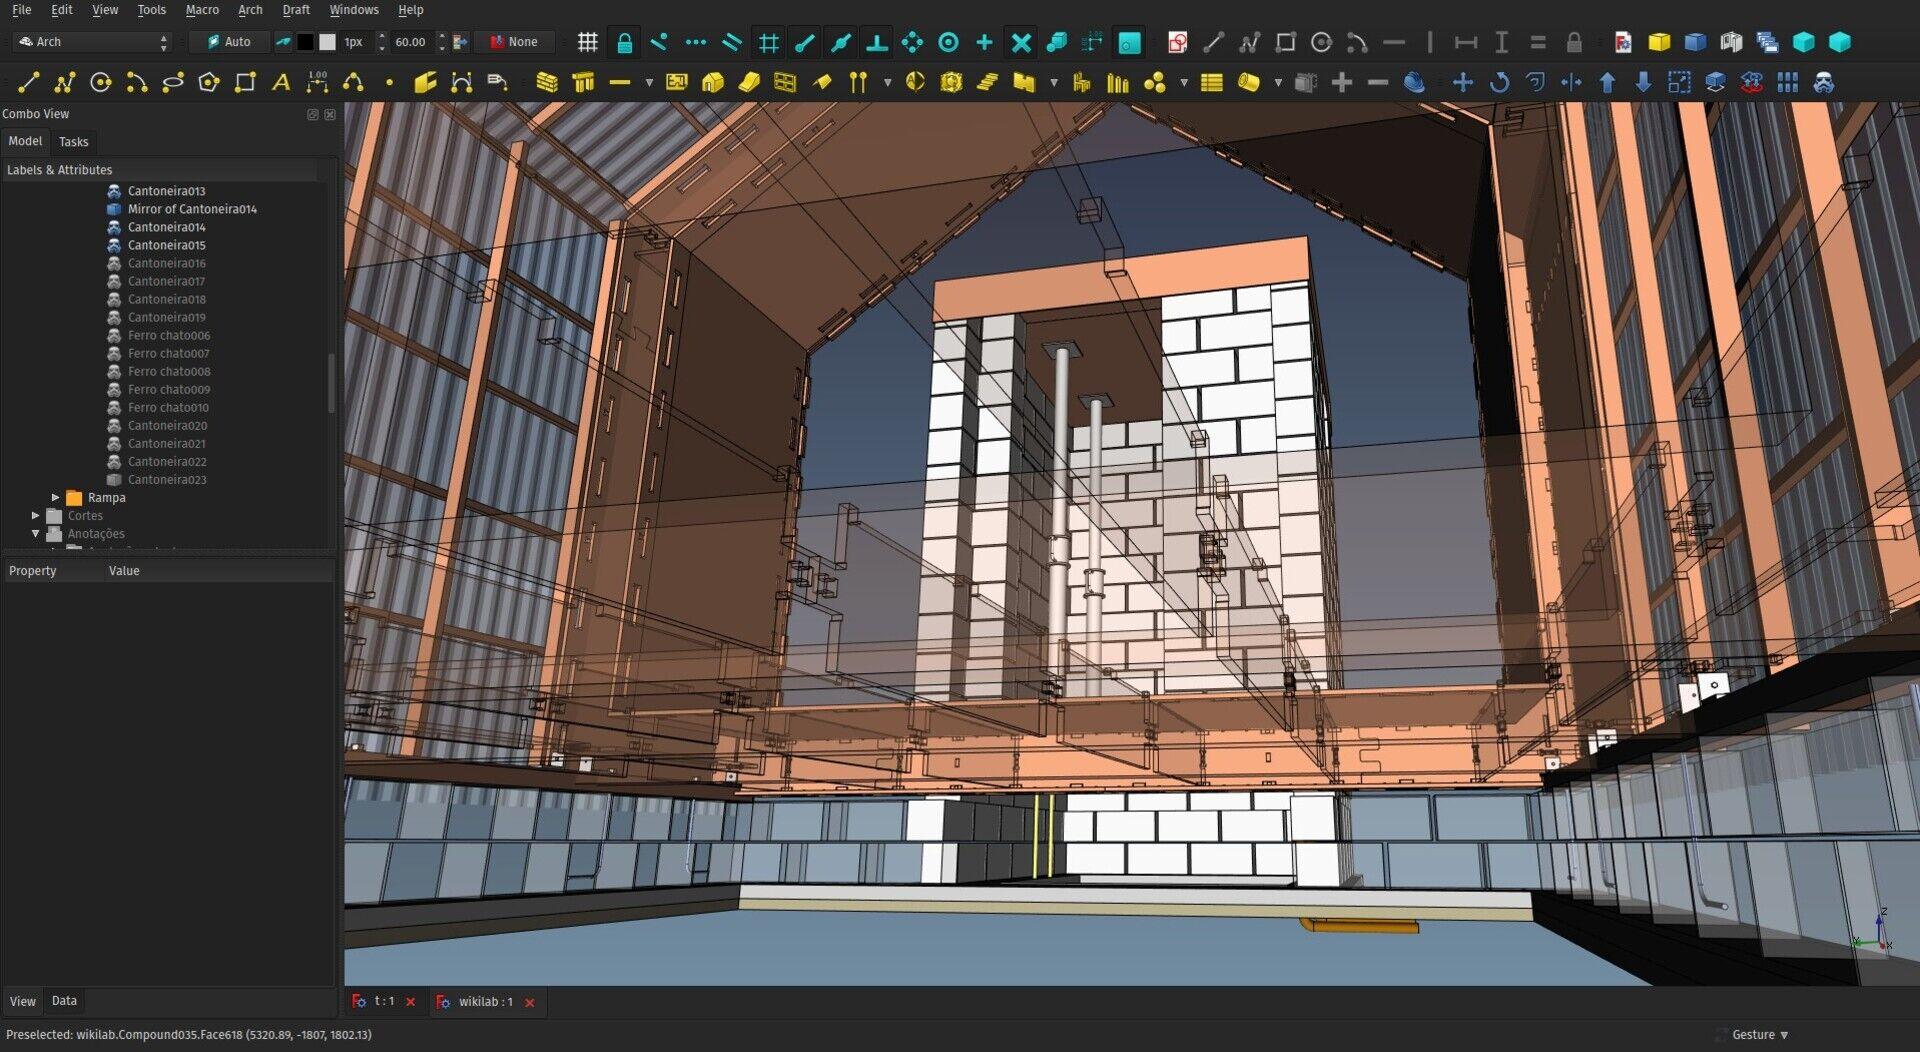 FreeCAD Arch development news - August 2017 - Yorik's Guestblog